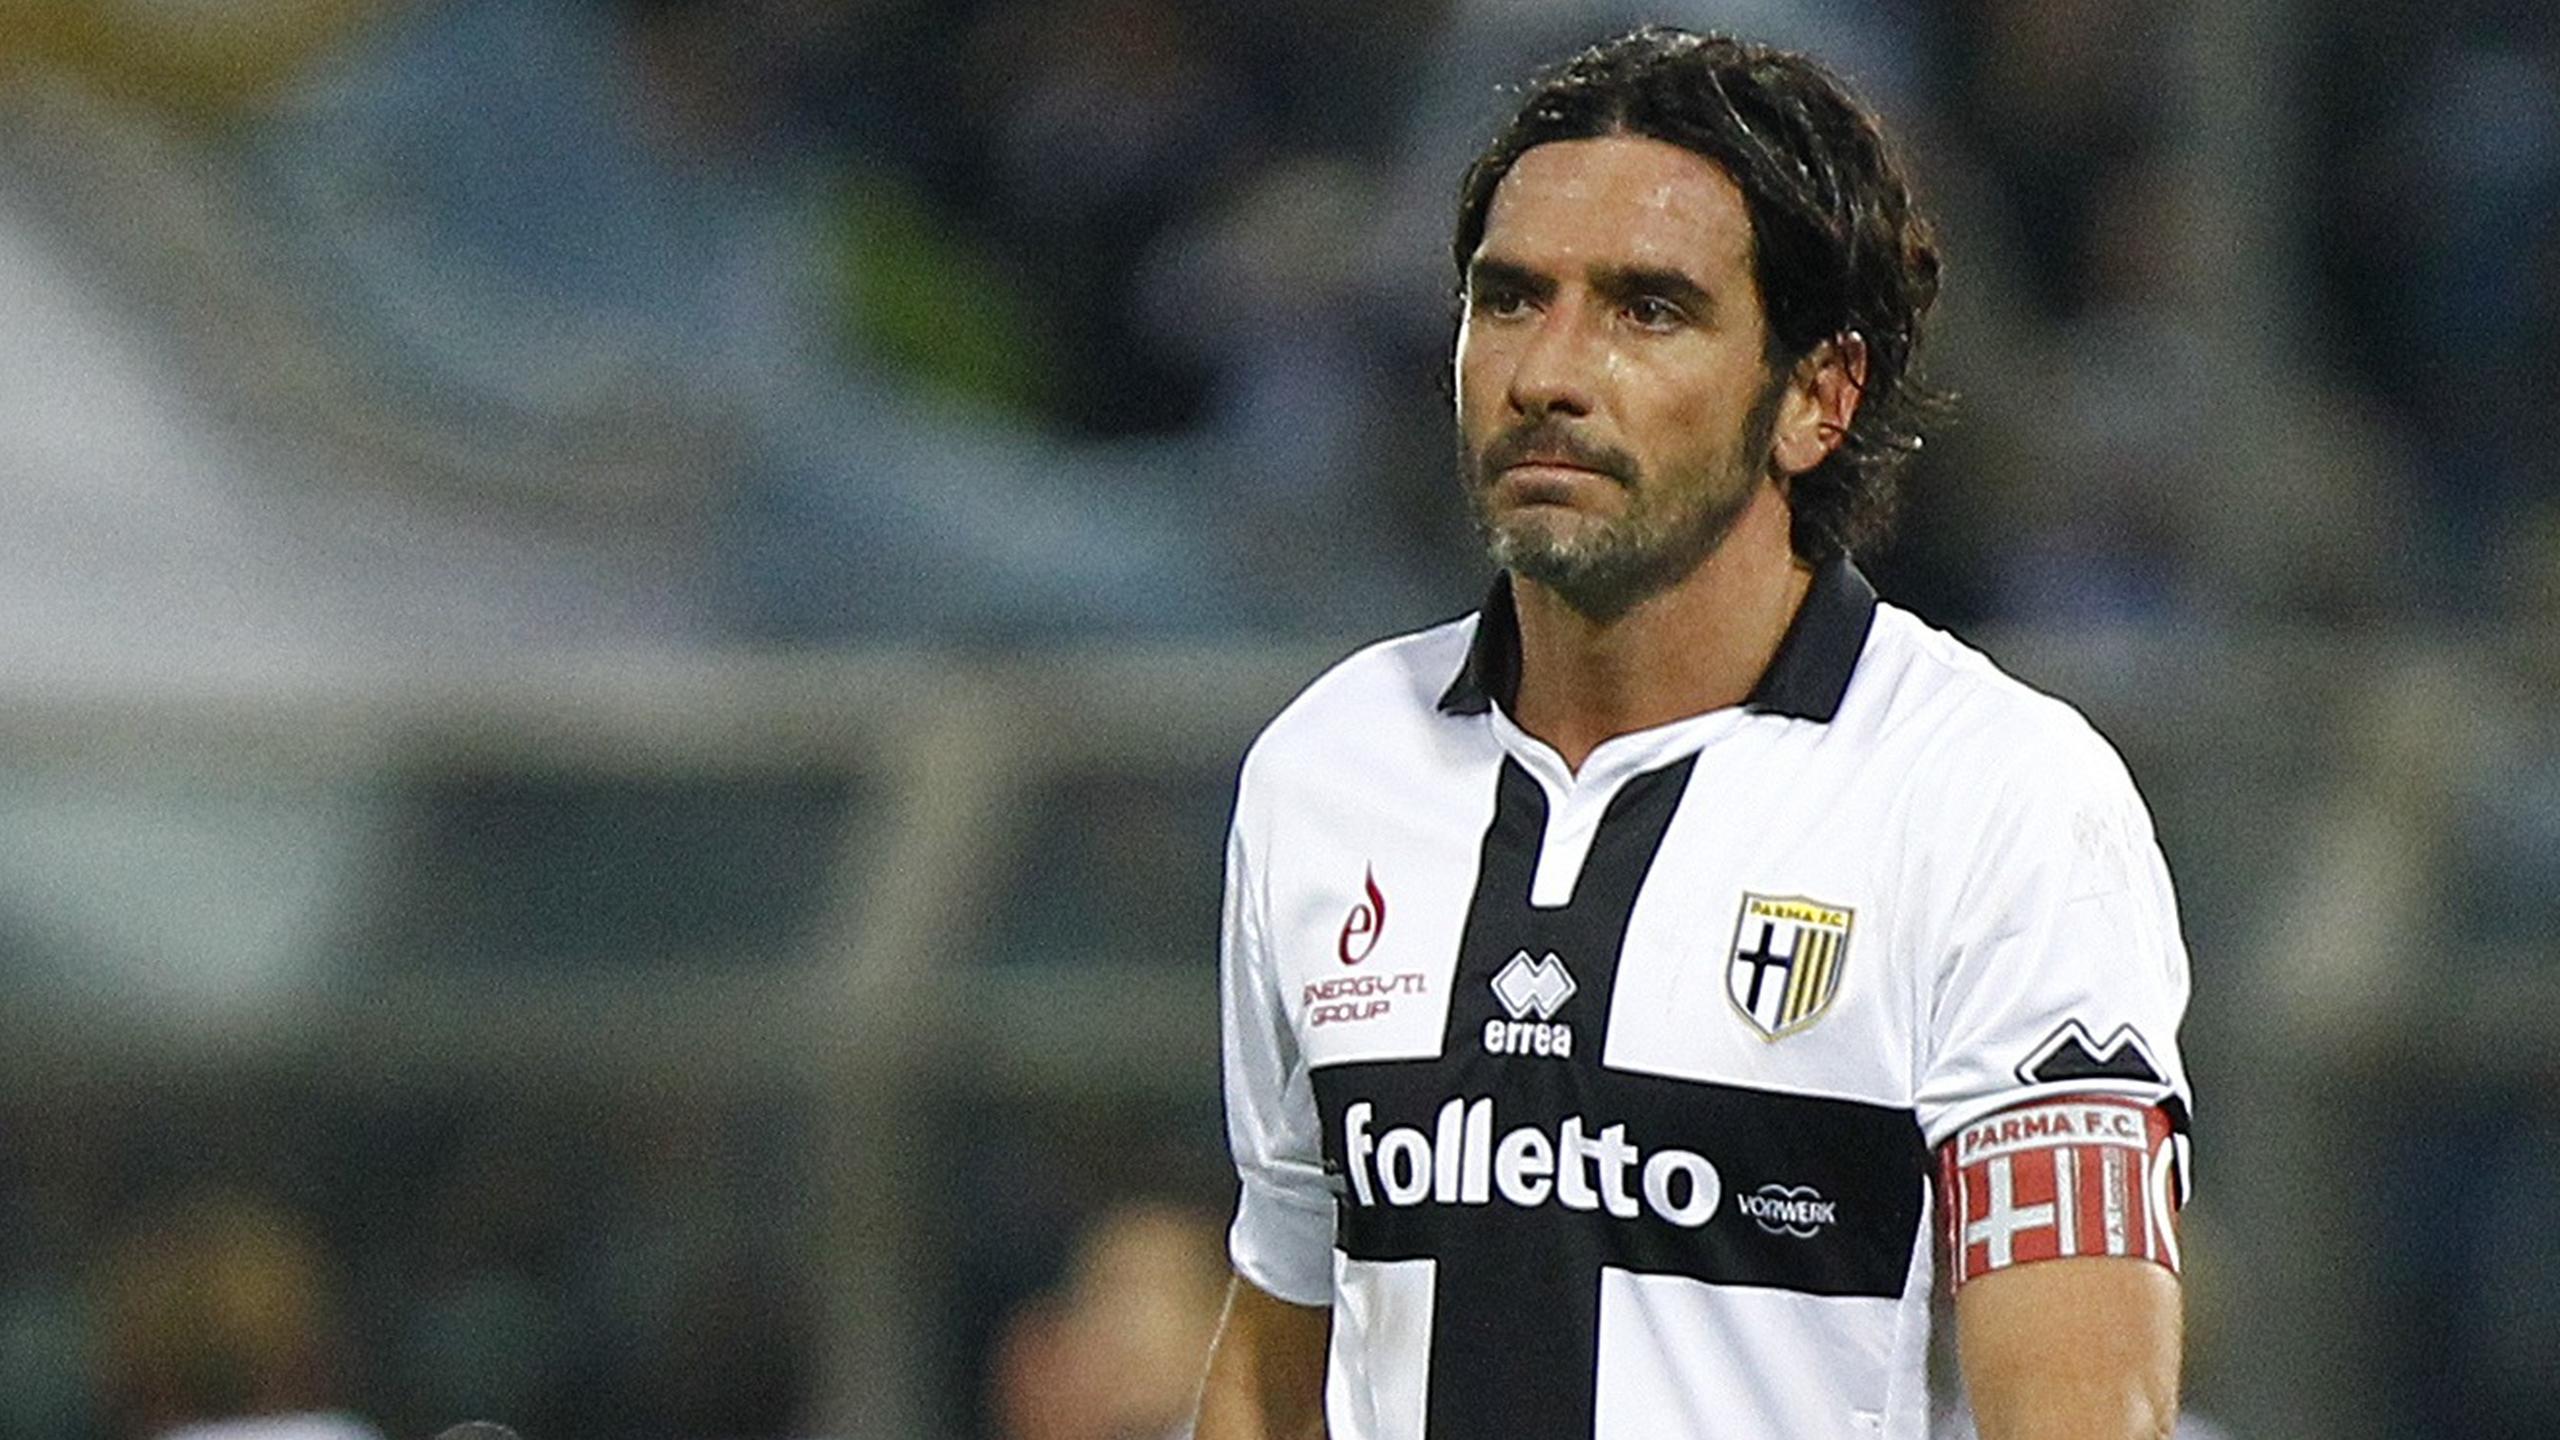 Alessandro Lucarelli capitano Parma